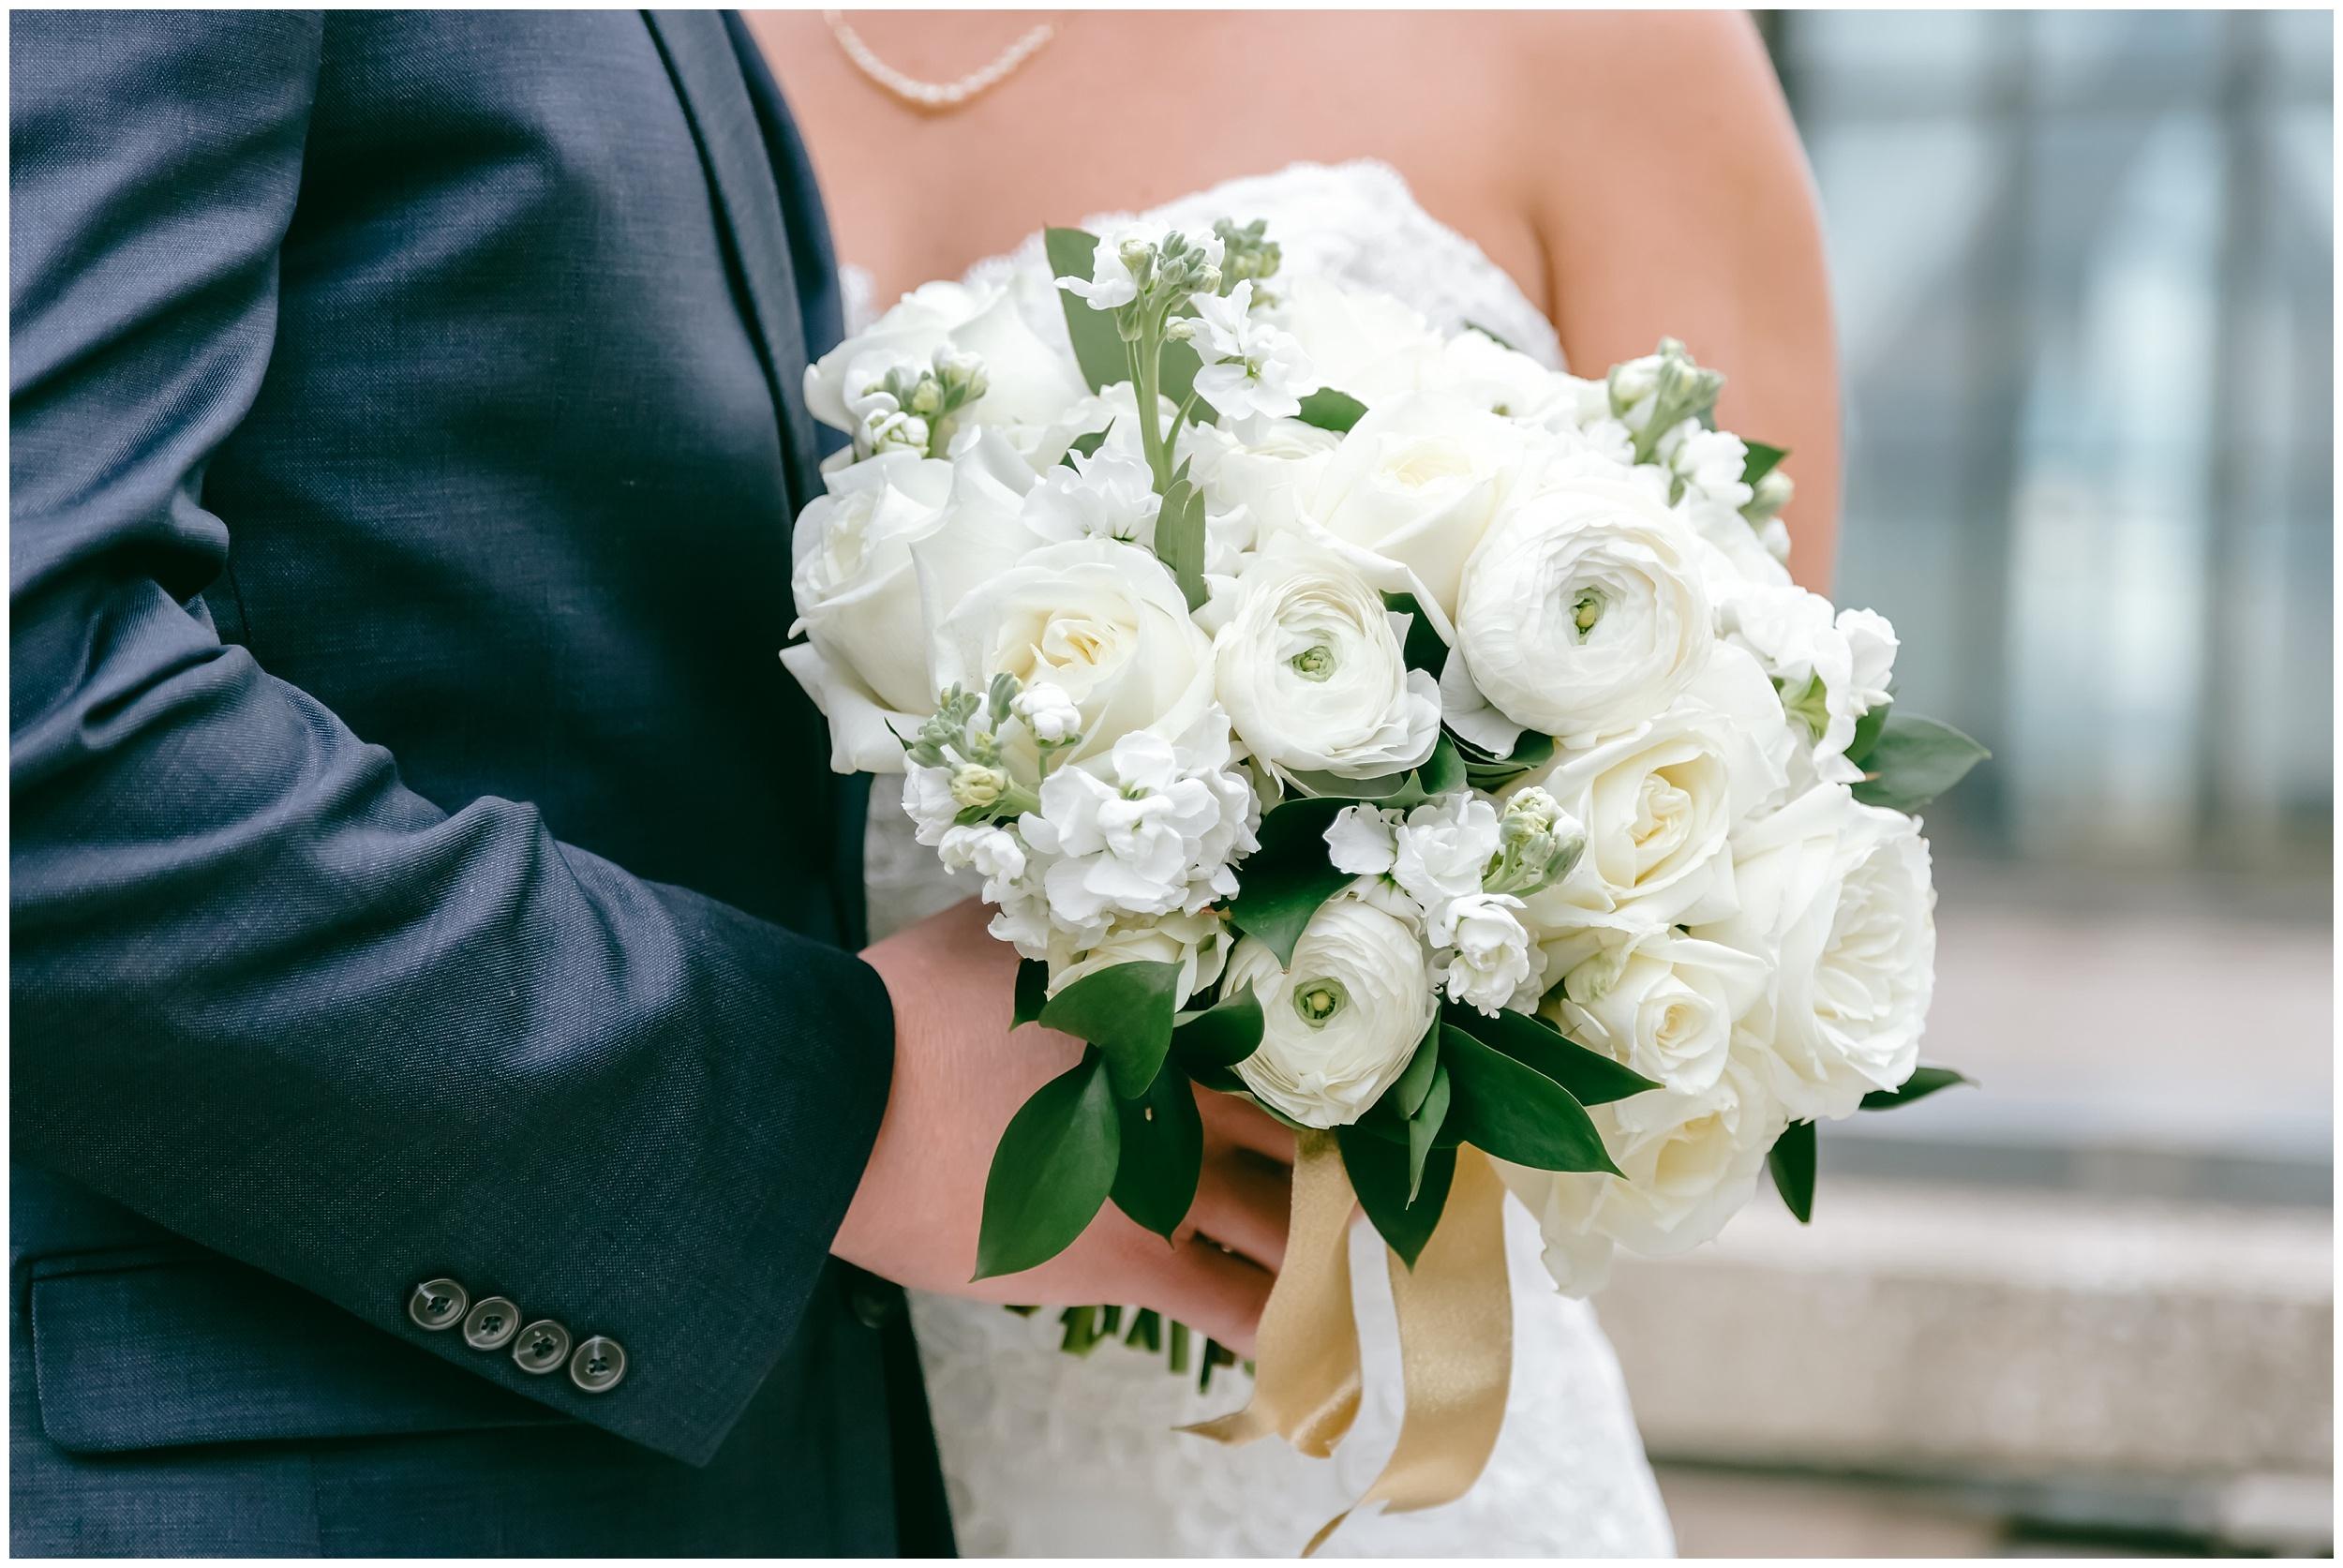 wedding-bridal-bouquet-bride-groom-portraits-washington-dc-photographer